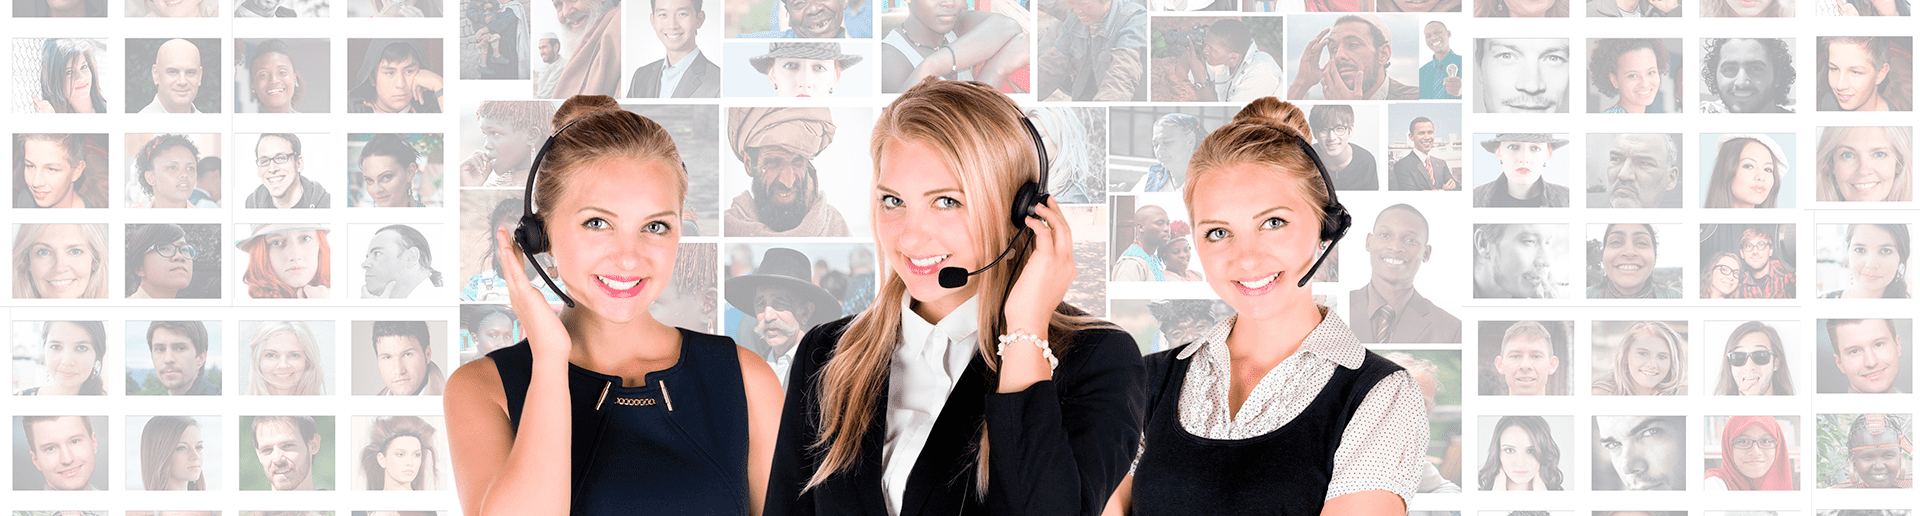 Immobilien Kunden Kommunikation